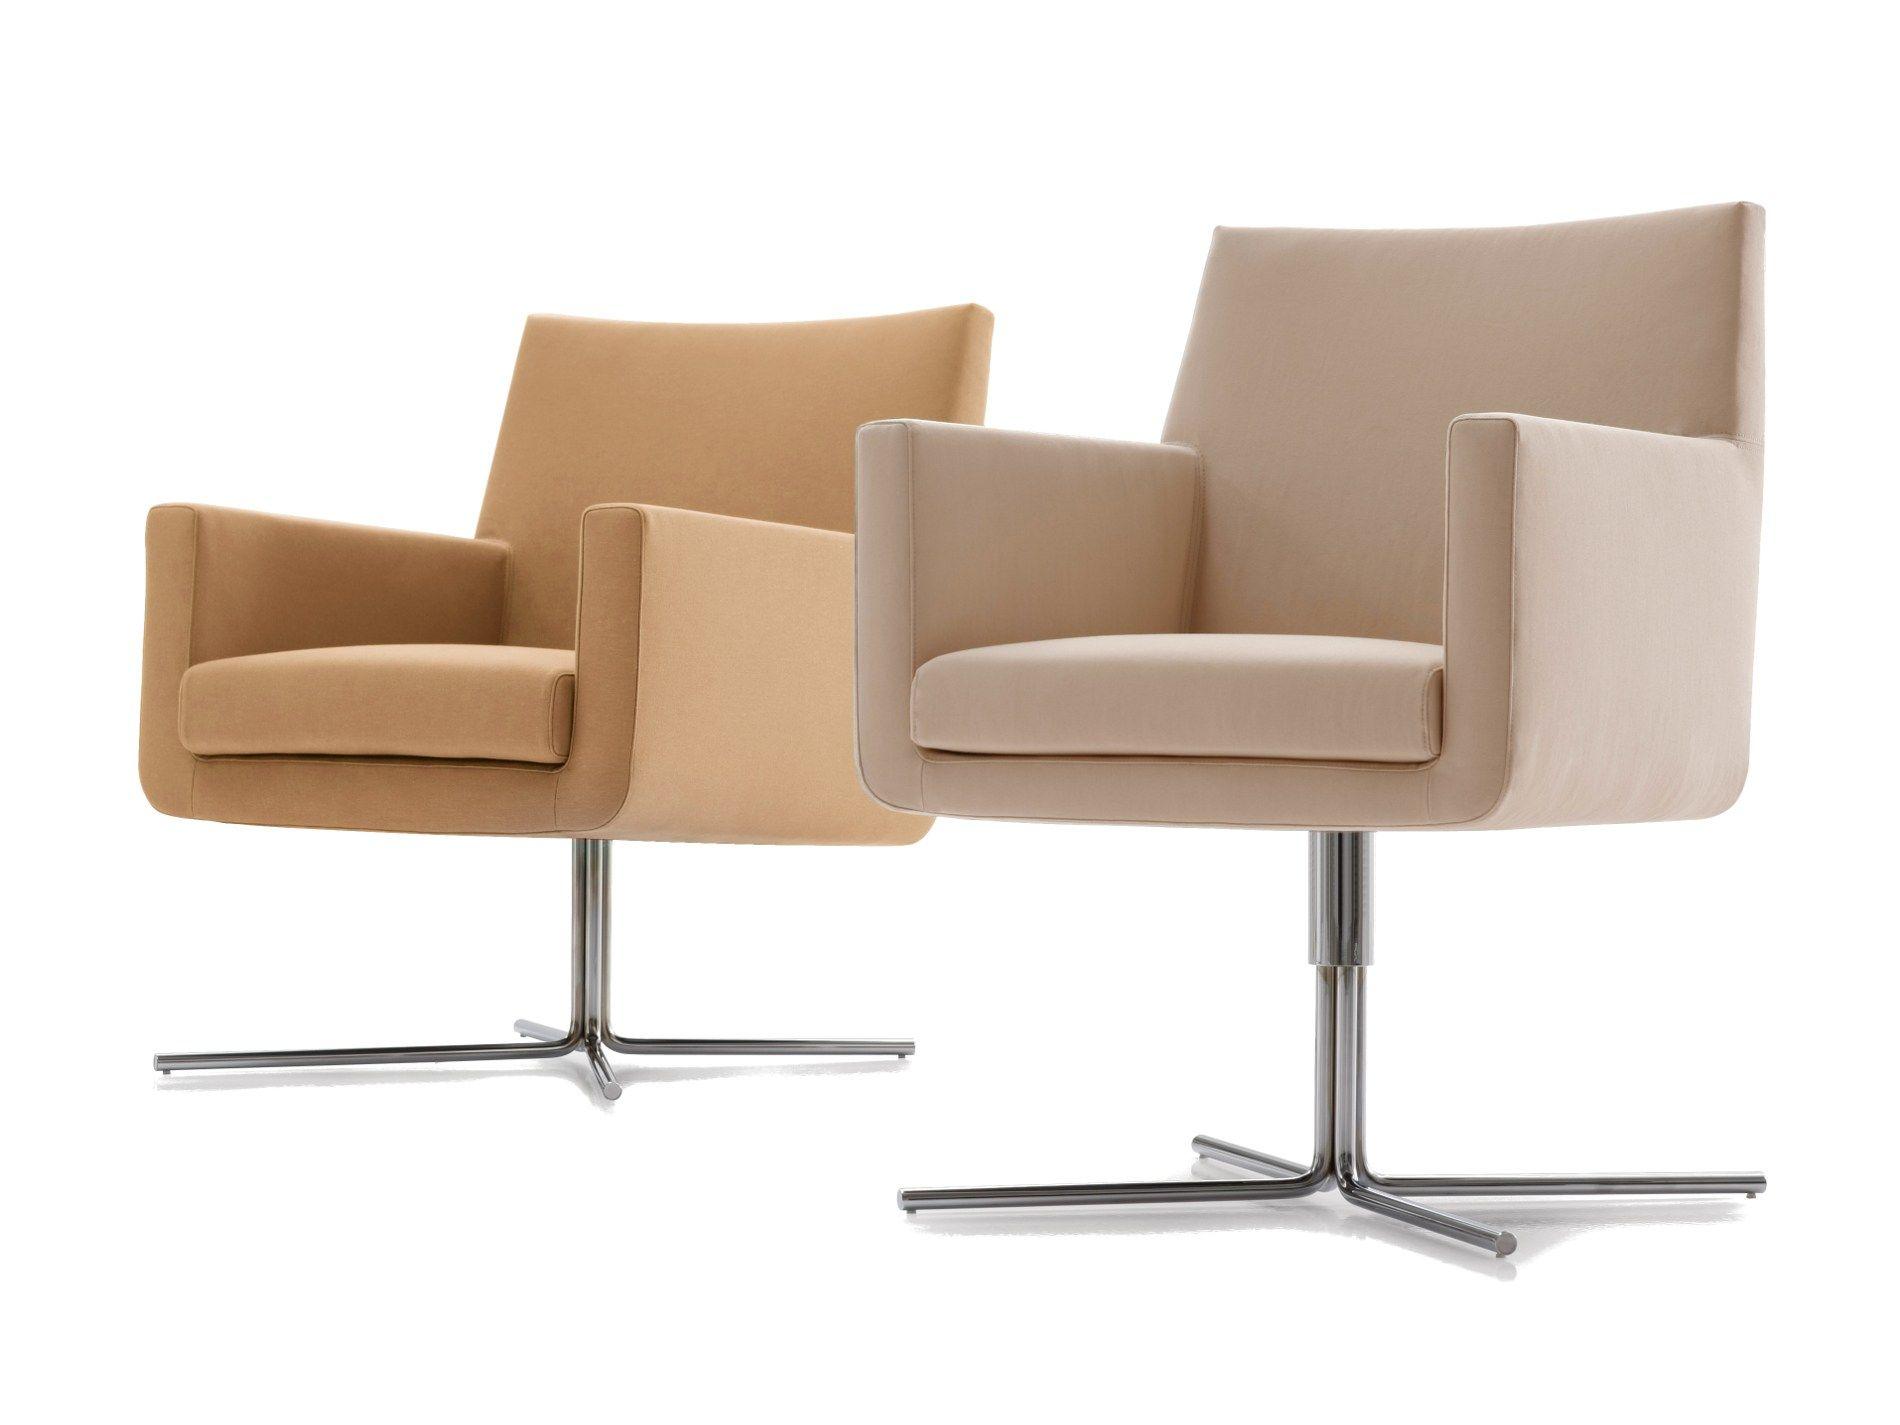 marken sofas gnstig marken modern work desk with storage. Black Bedroom Furniture Sets. Home Design Ideas